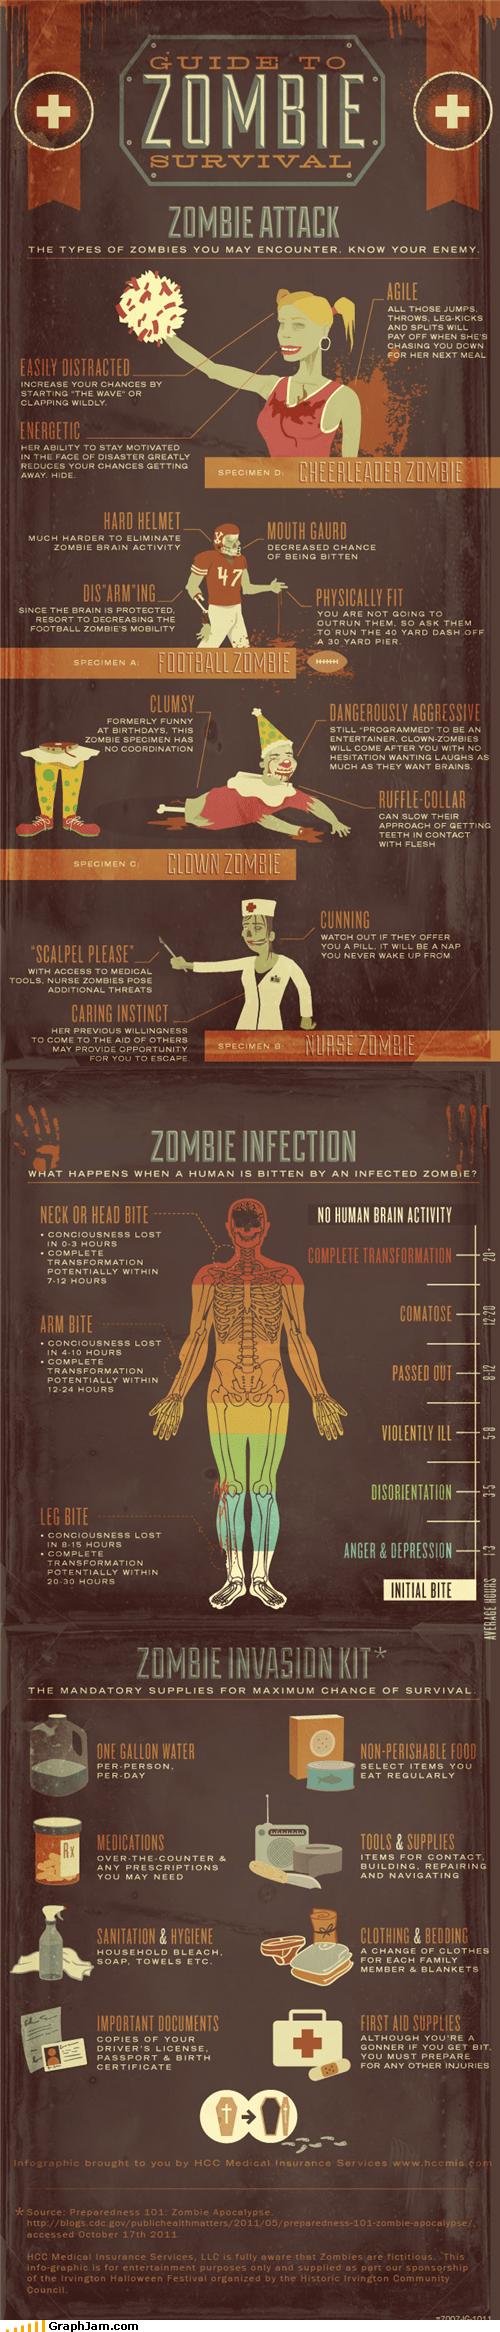 best of week,infographic,preparation,survival,zombie,zombie apocalypse